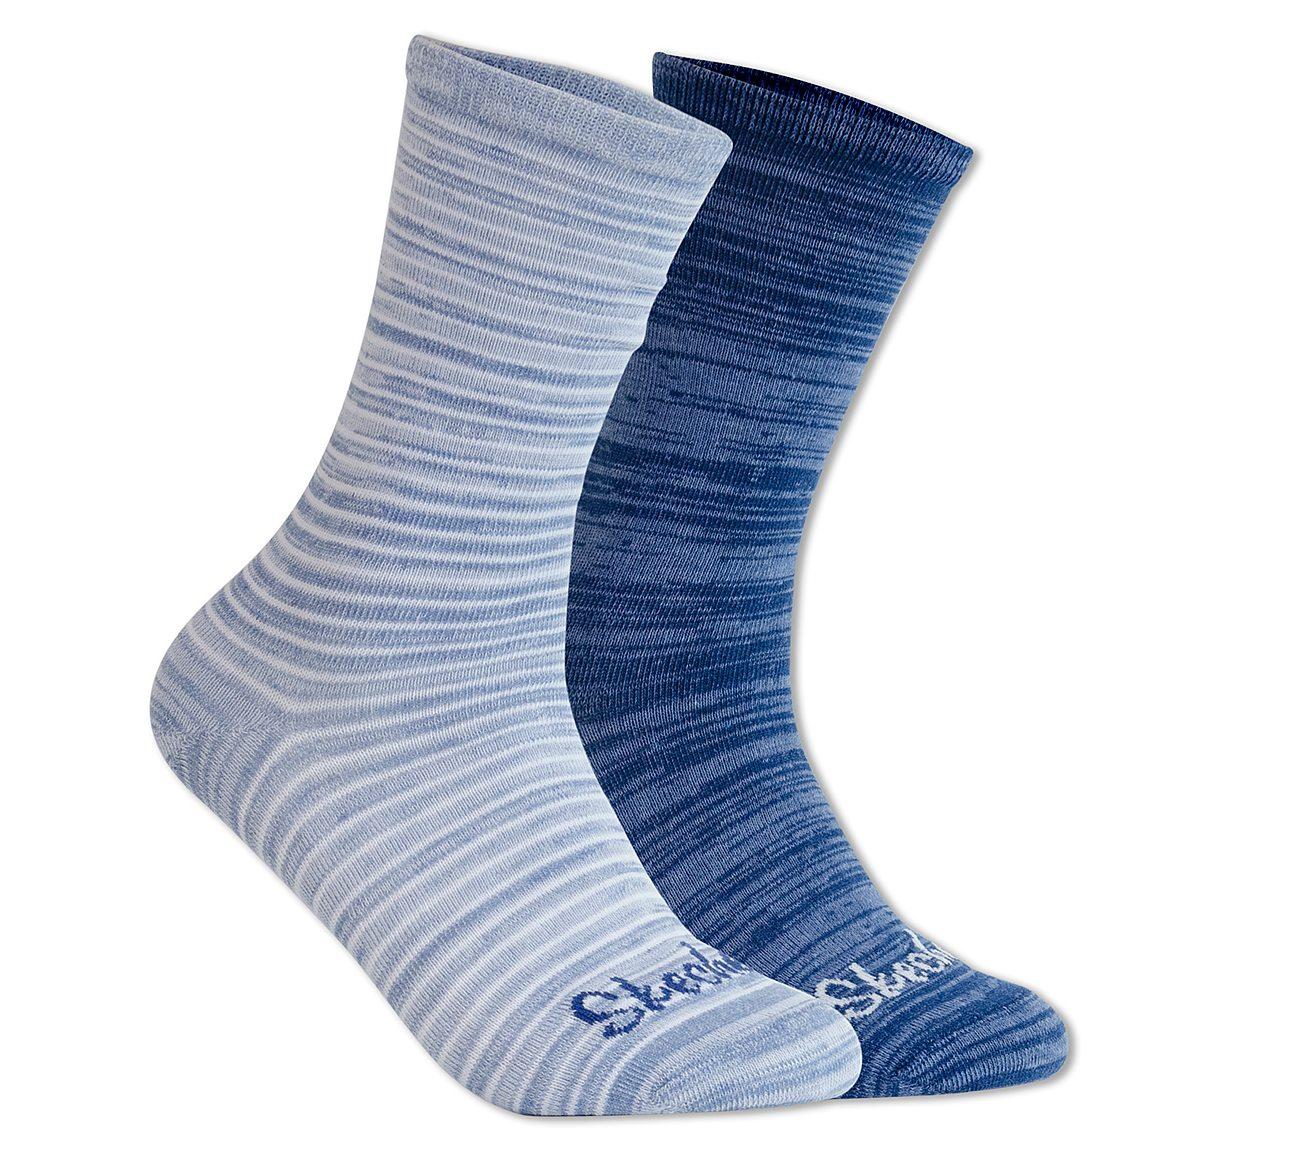 2 Pack Blues Crew Socks